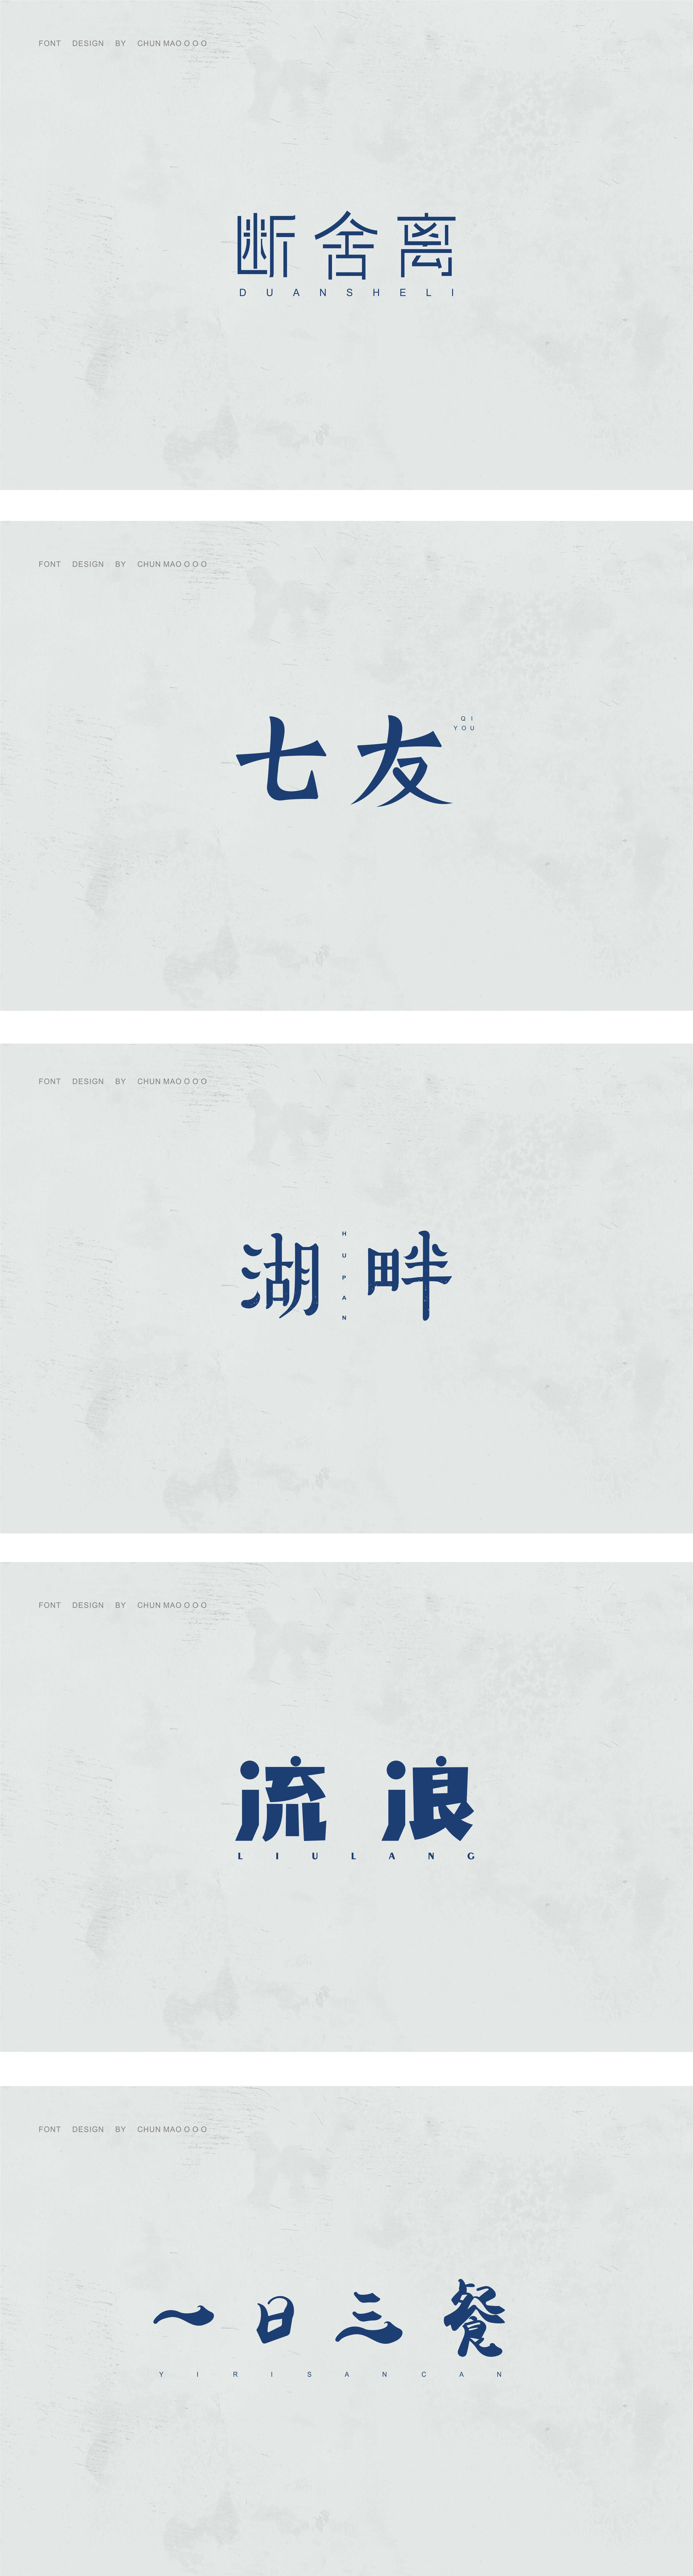 4P Creative Chinese font logo design scheme #.871